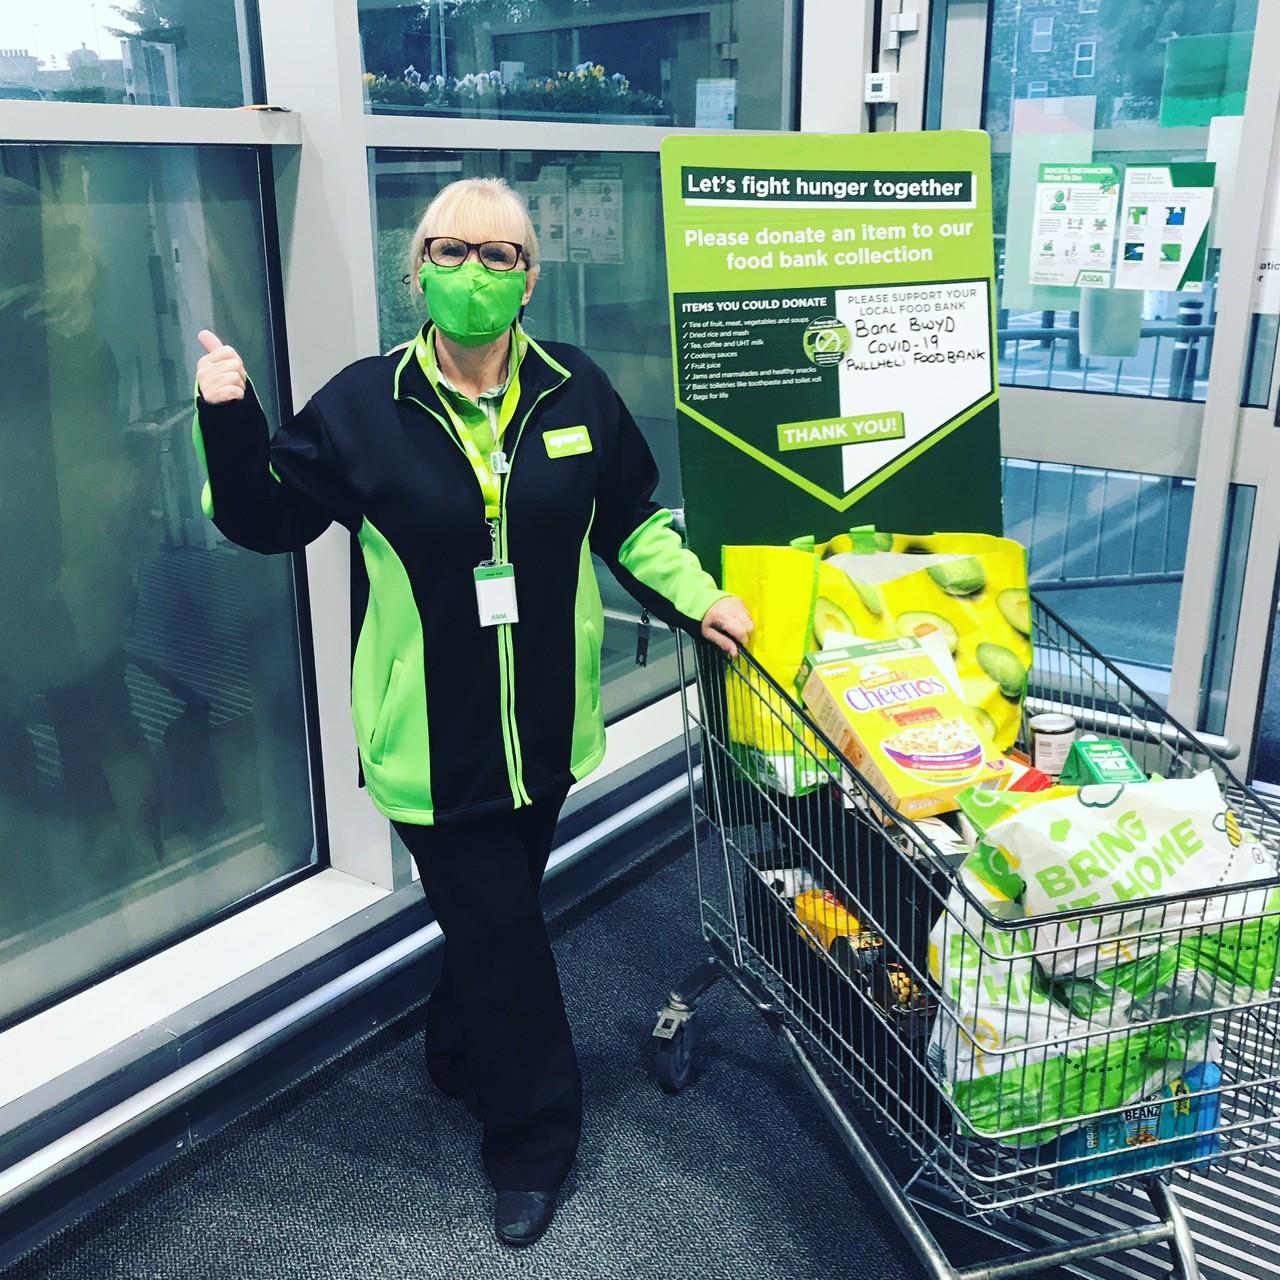 Donations to foodbank | Asda Pwllheli